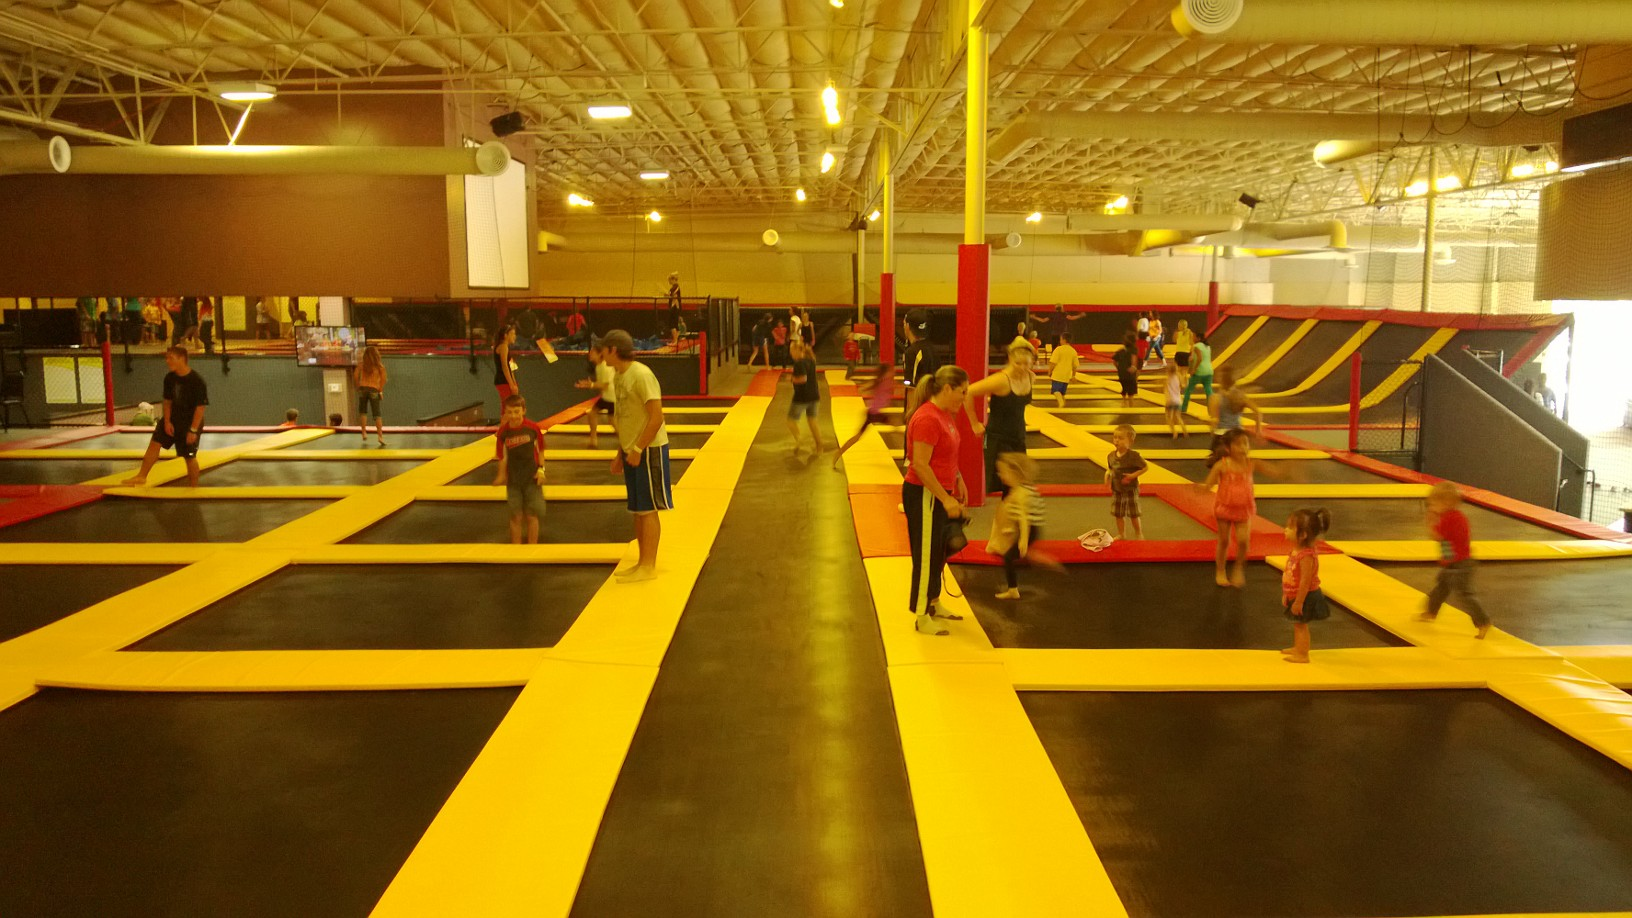 Aerosports trampoline park coupons